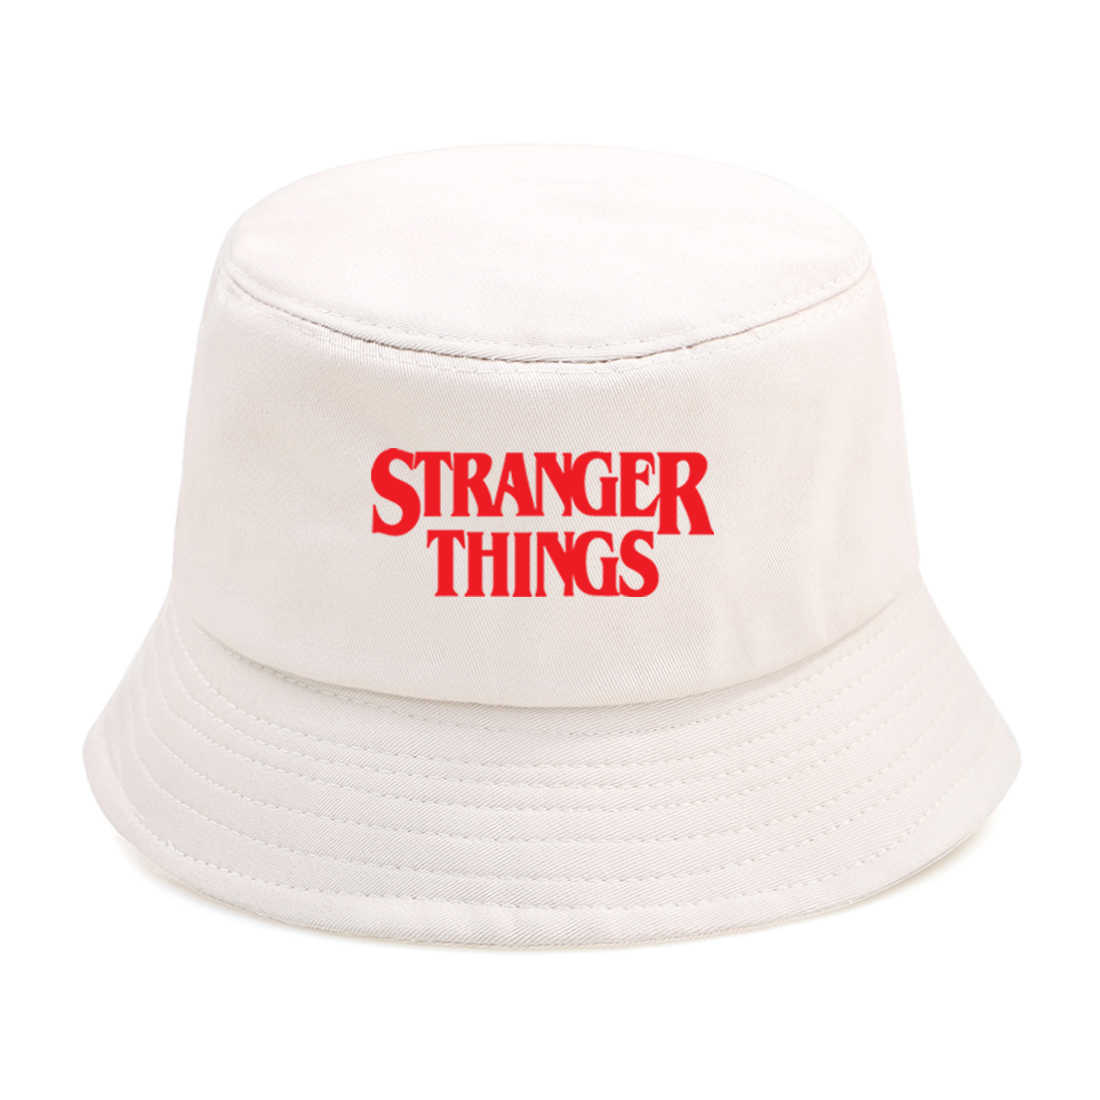 JXMK 56-58cm Hip Hop Stranger Things Bucket Hat Outdoor Summer Foldable Fishing Fisherman Hat Mens Sunscreen Beach Hat Unisex Panama Hat